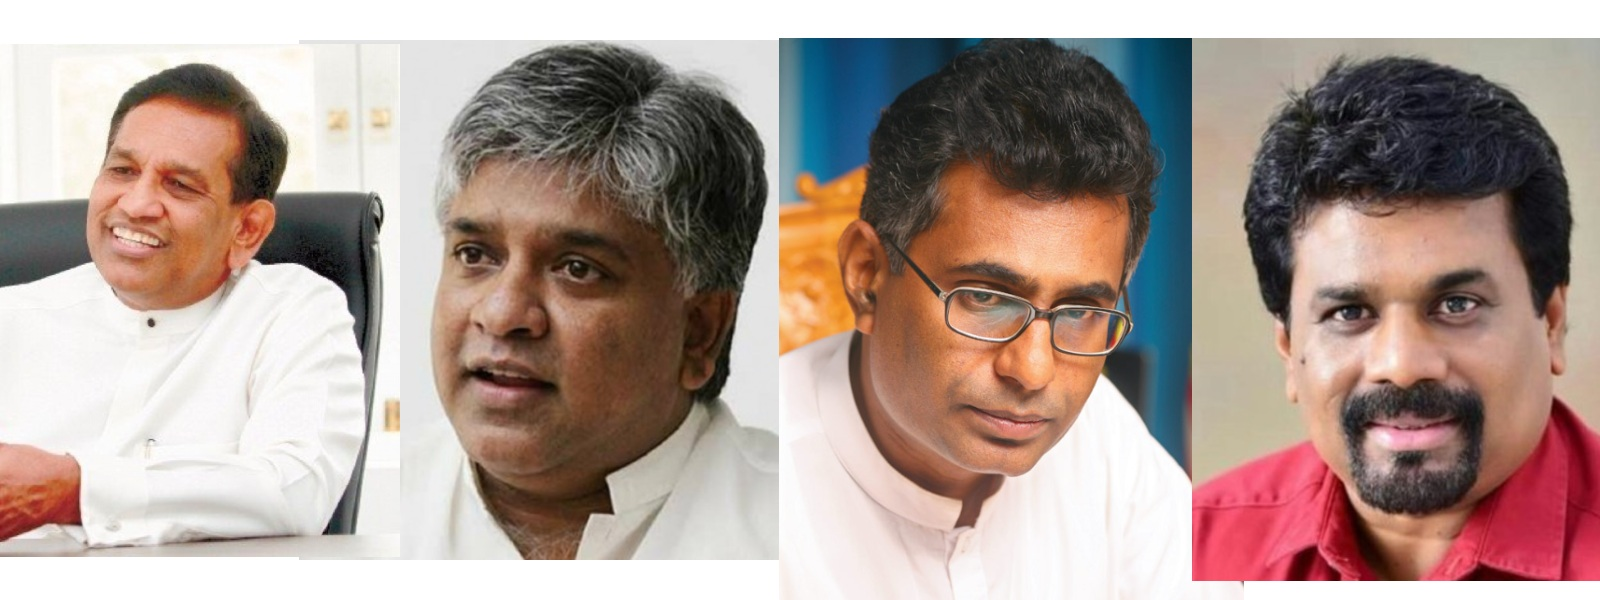 Former Ministers Rajitha Senaratne, Arjuna Ranatunga, Patali Champika Ranawaka and Former MP Anura Kumara Dissanayake summoned to the Presidential Commission of Inquiry appointed to probe incidents of Political Victimization